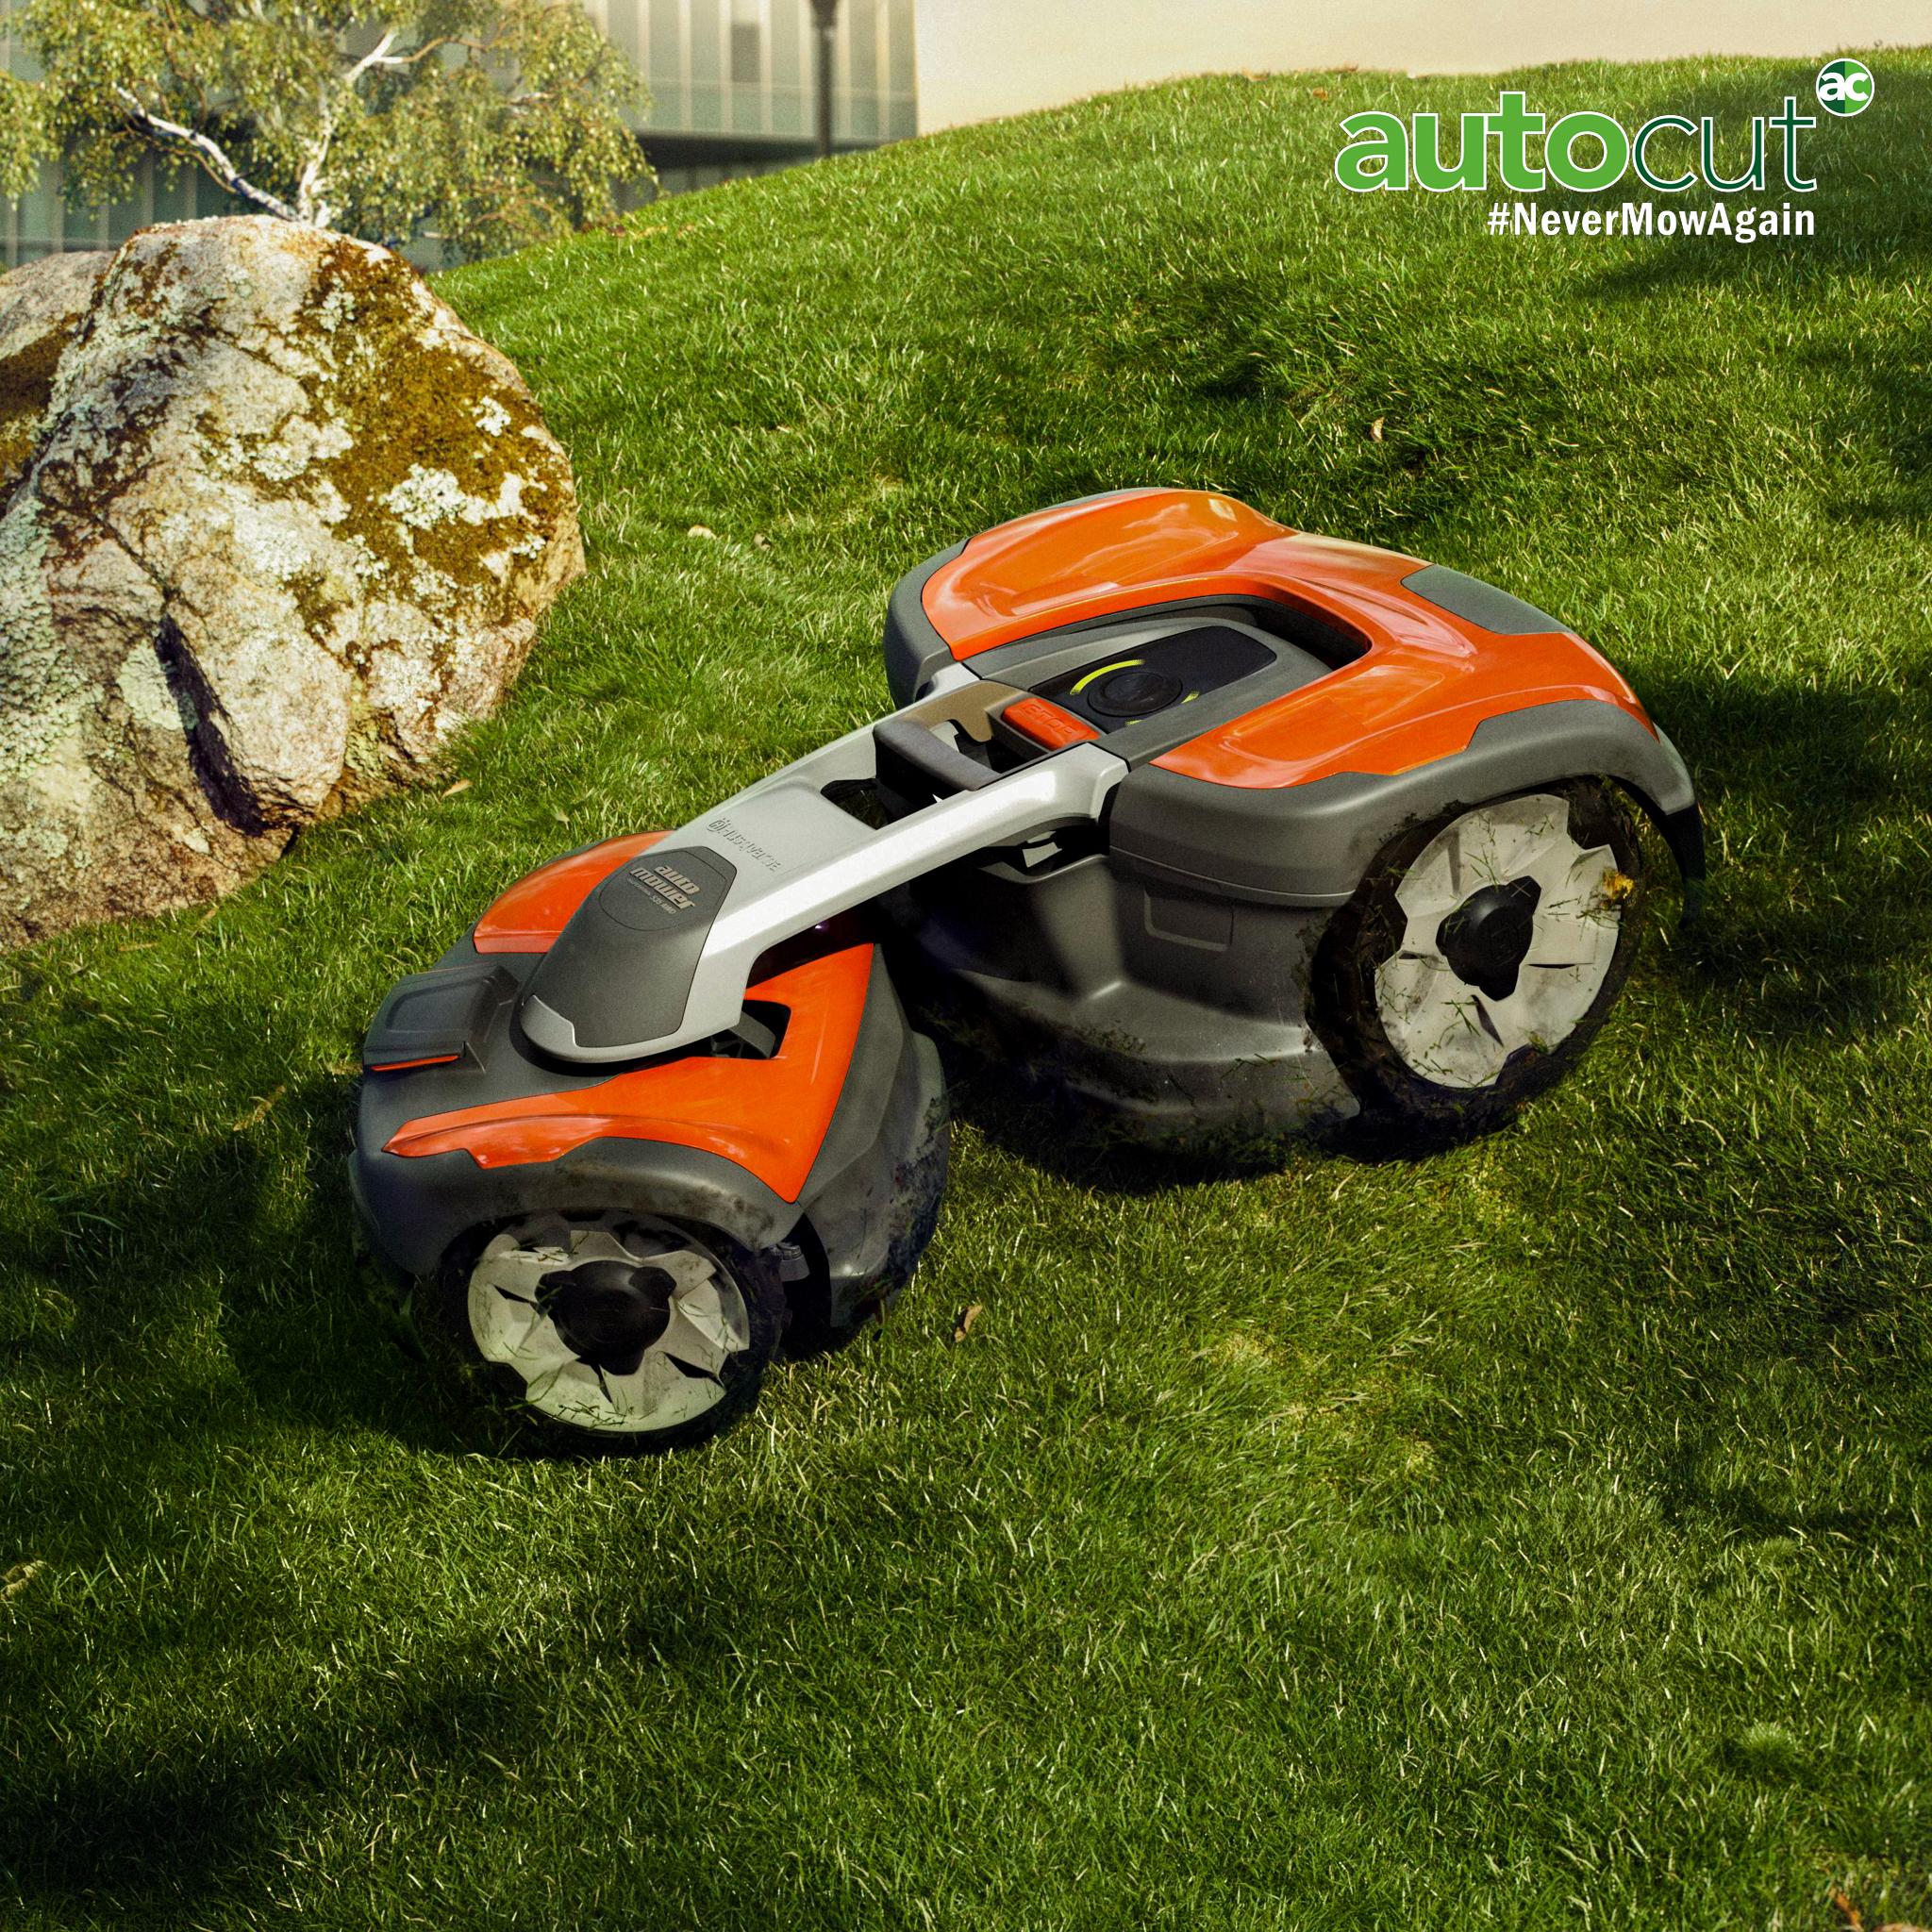 Meet the Mower: Automower® 535 AWD